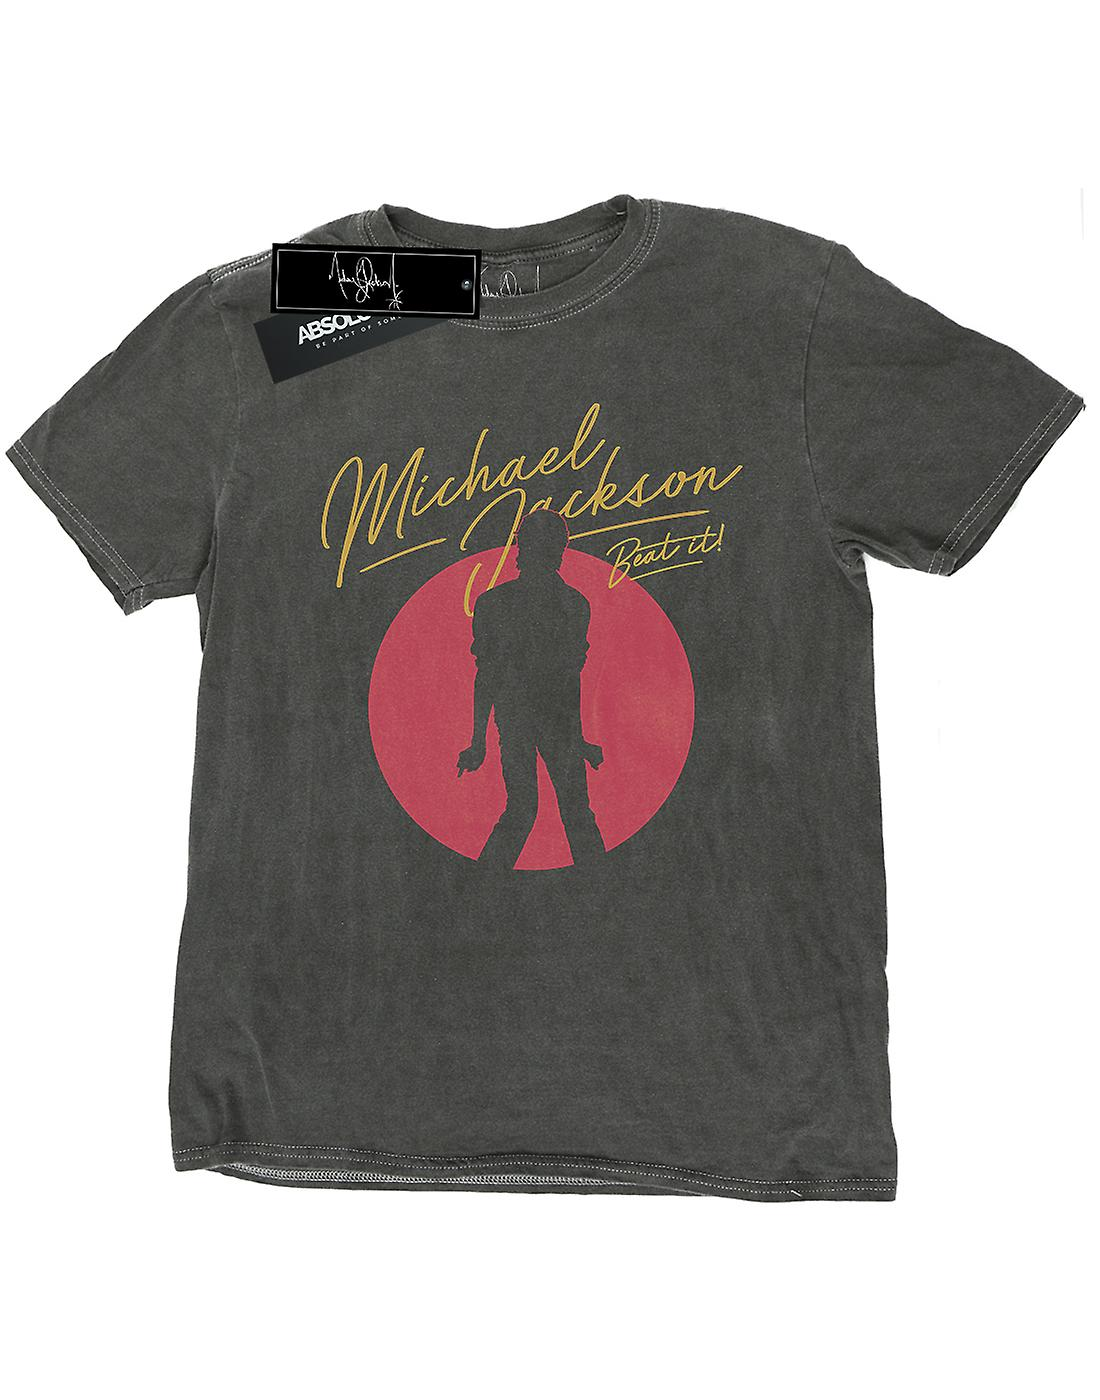 Michael Jackson Men's 80's Photo Washed T-Shirt